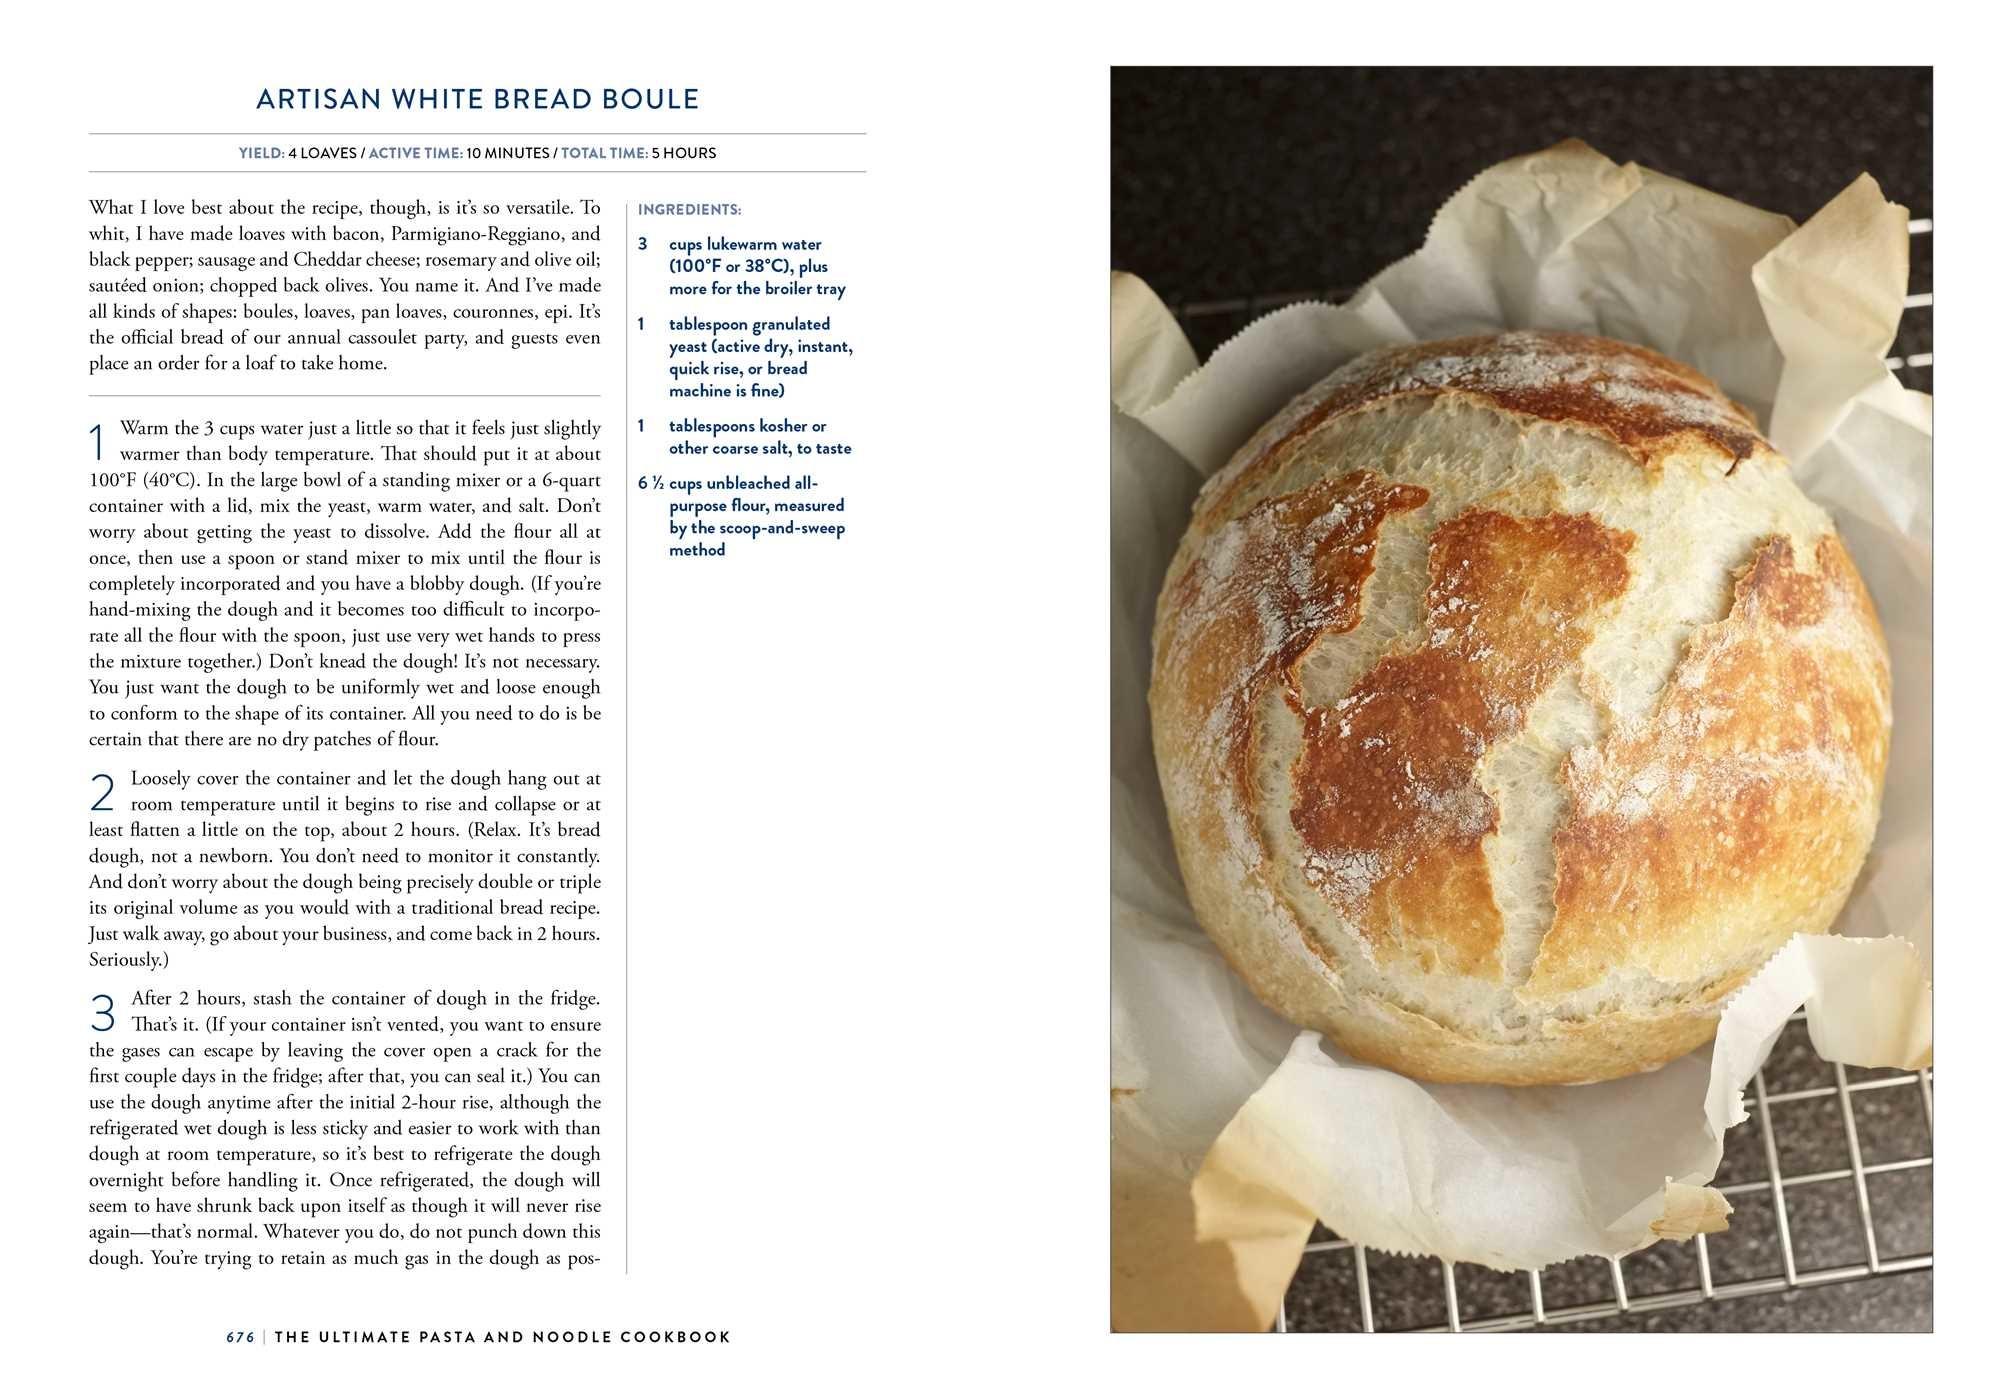 The big book of crusts 9781604337365.in03